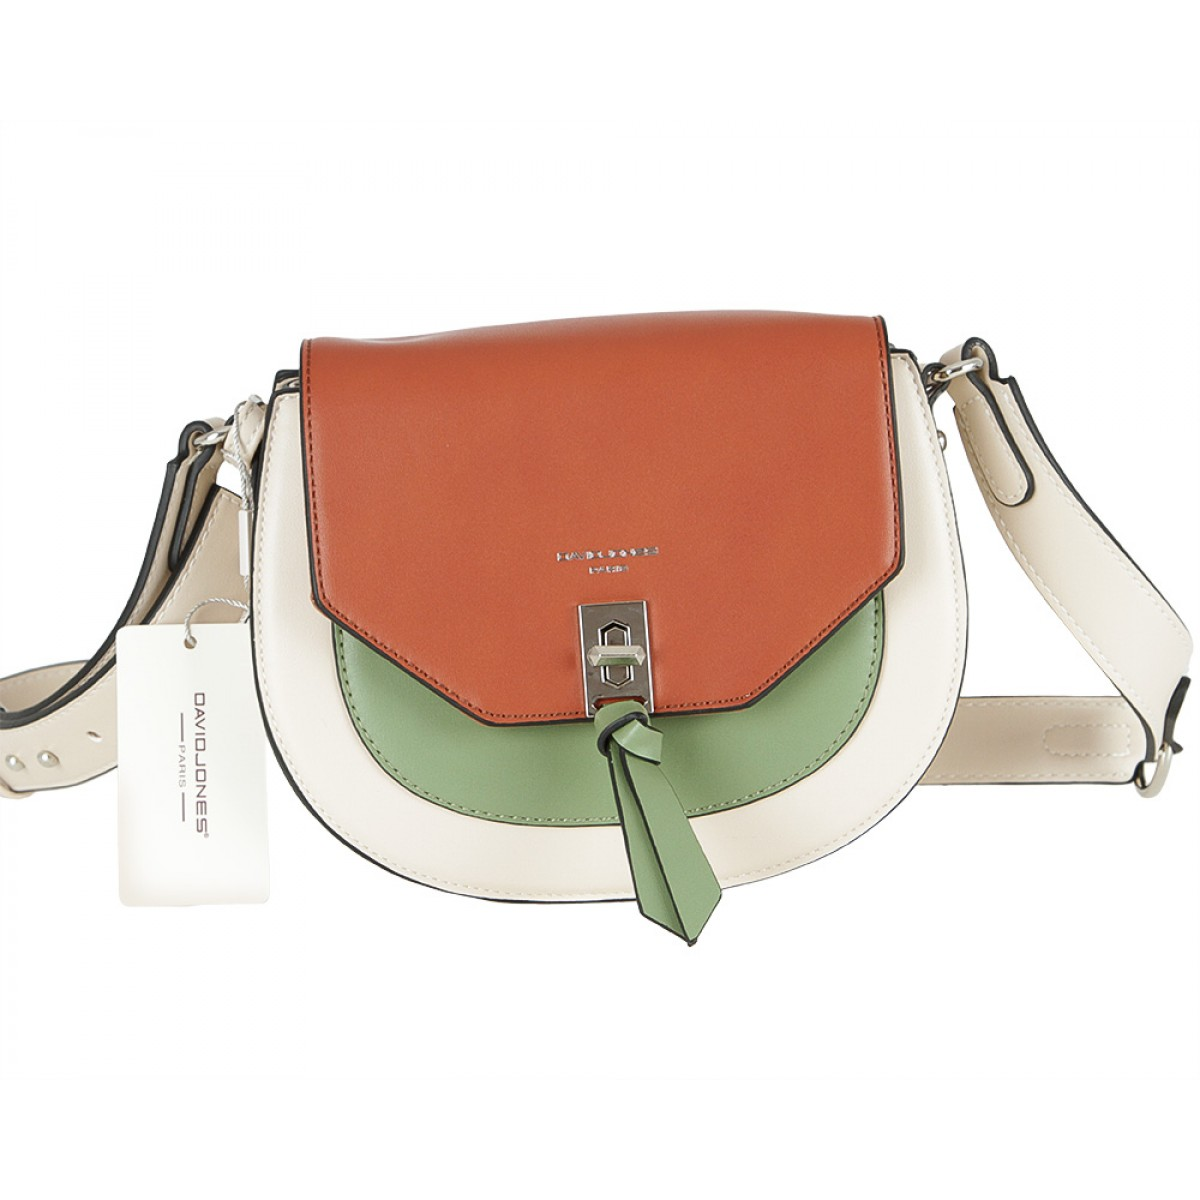 Жіноча сумка David Jones 6239-1 BEIGE